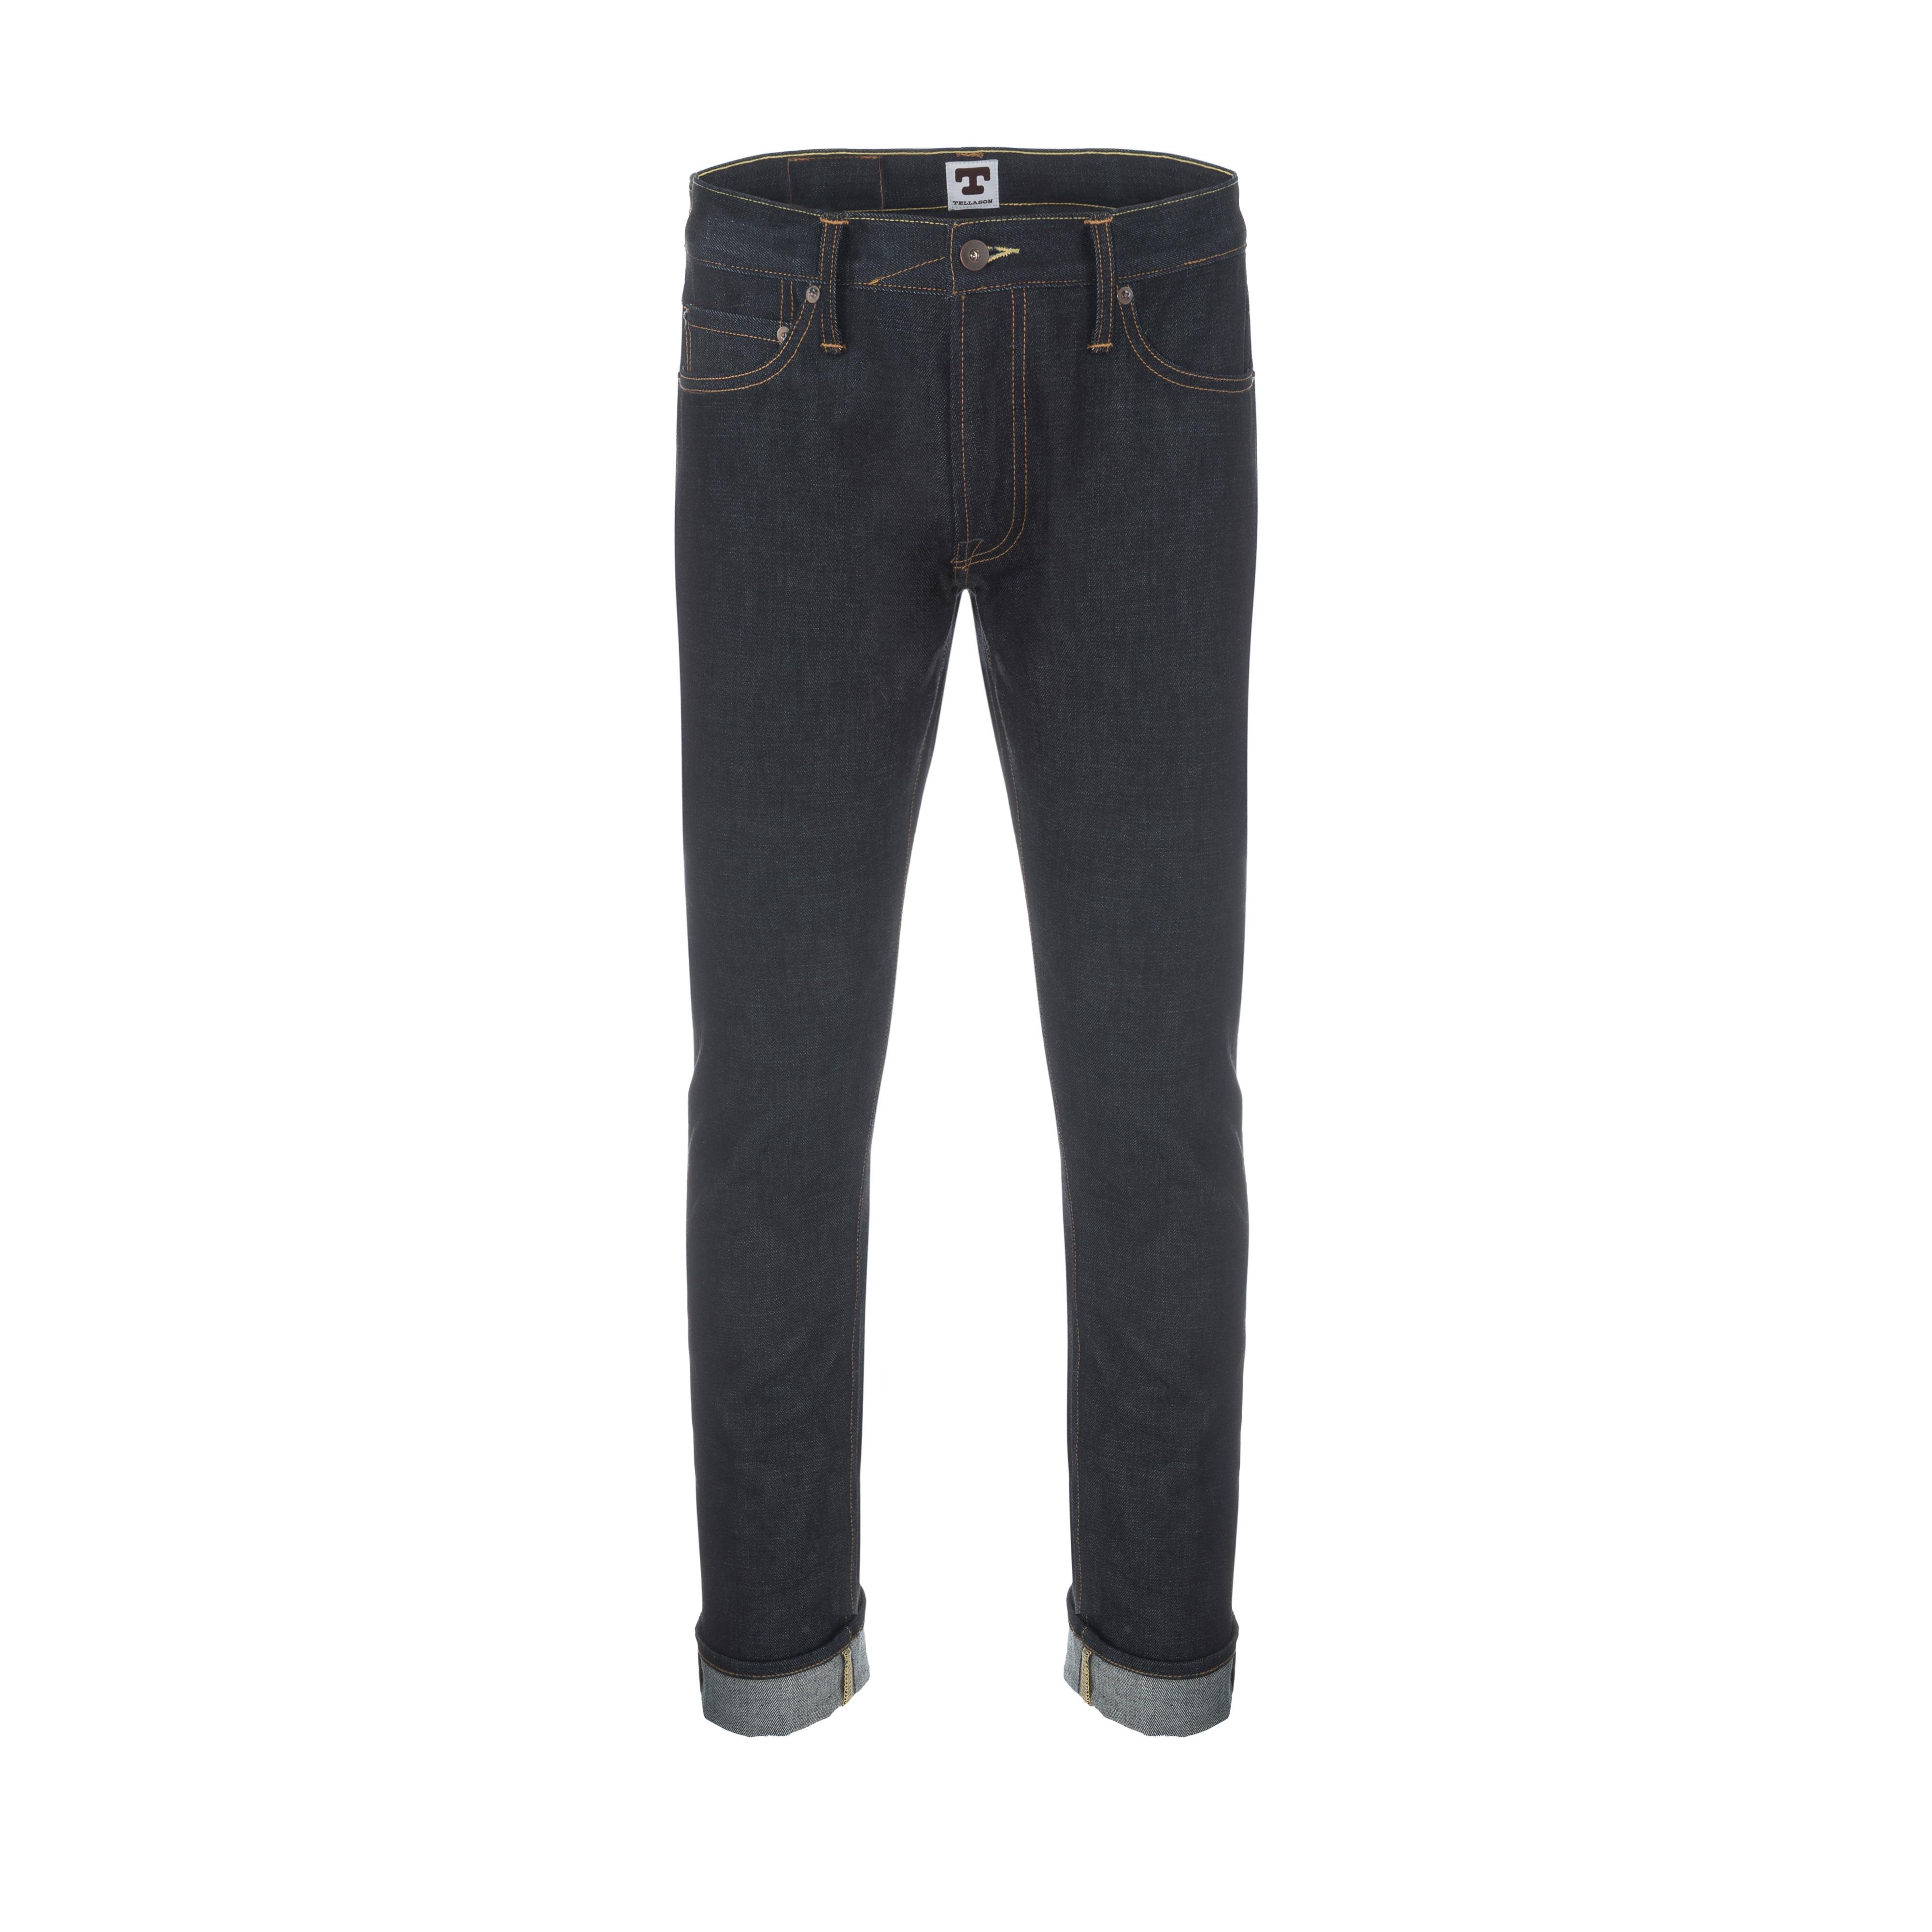 Gustave 14.75oz Raw Denim Jeans Indigo